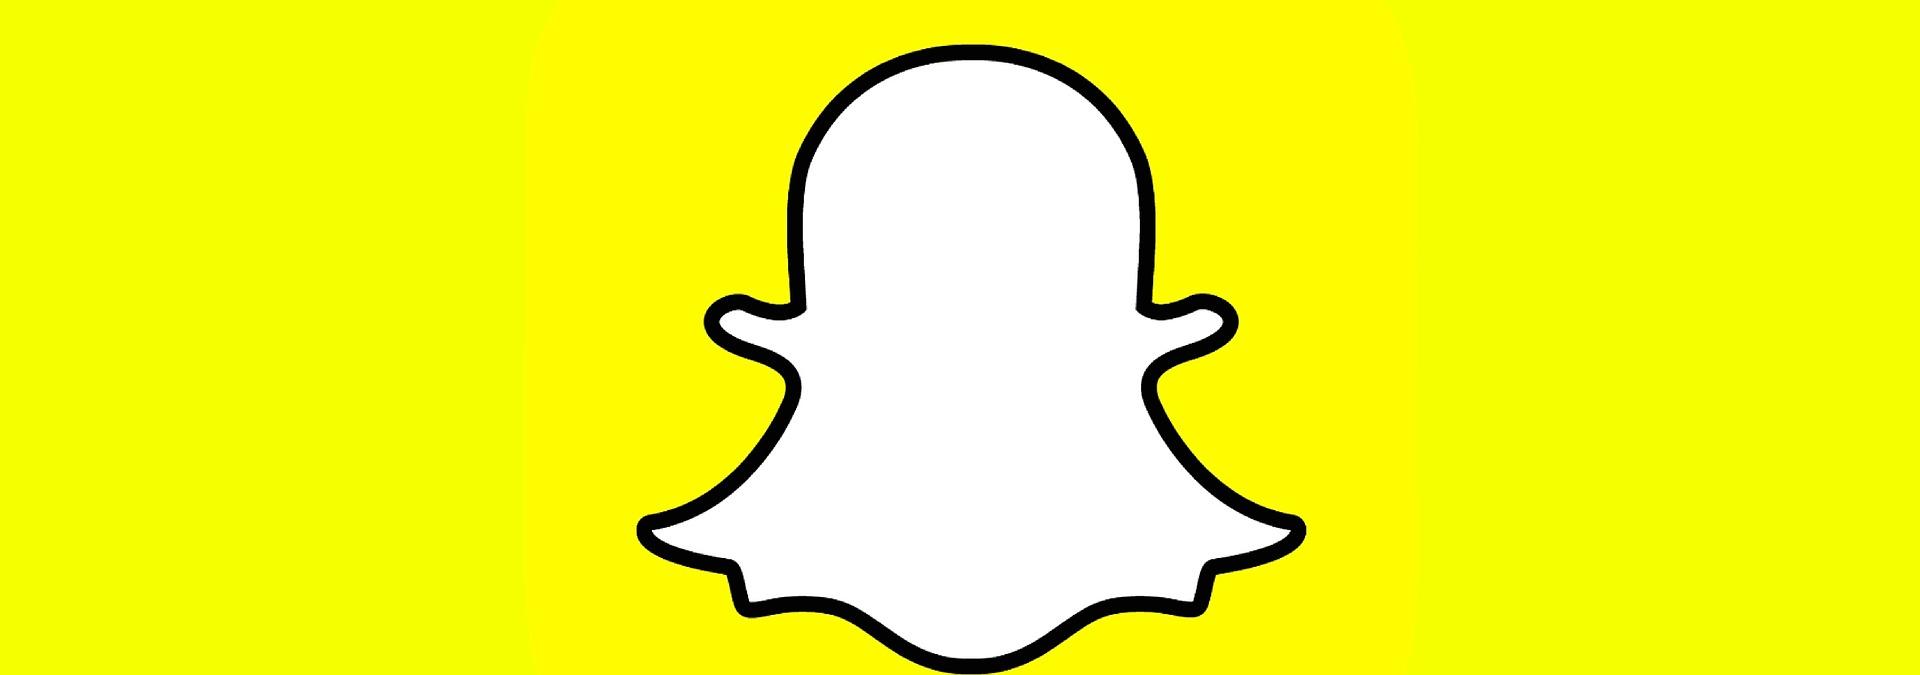 Image of Snapchat Ghost logo